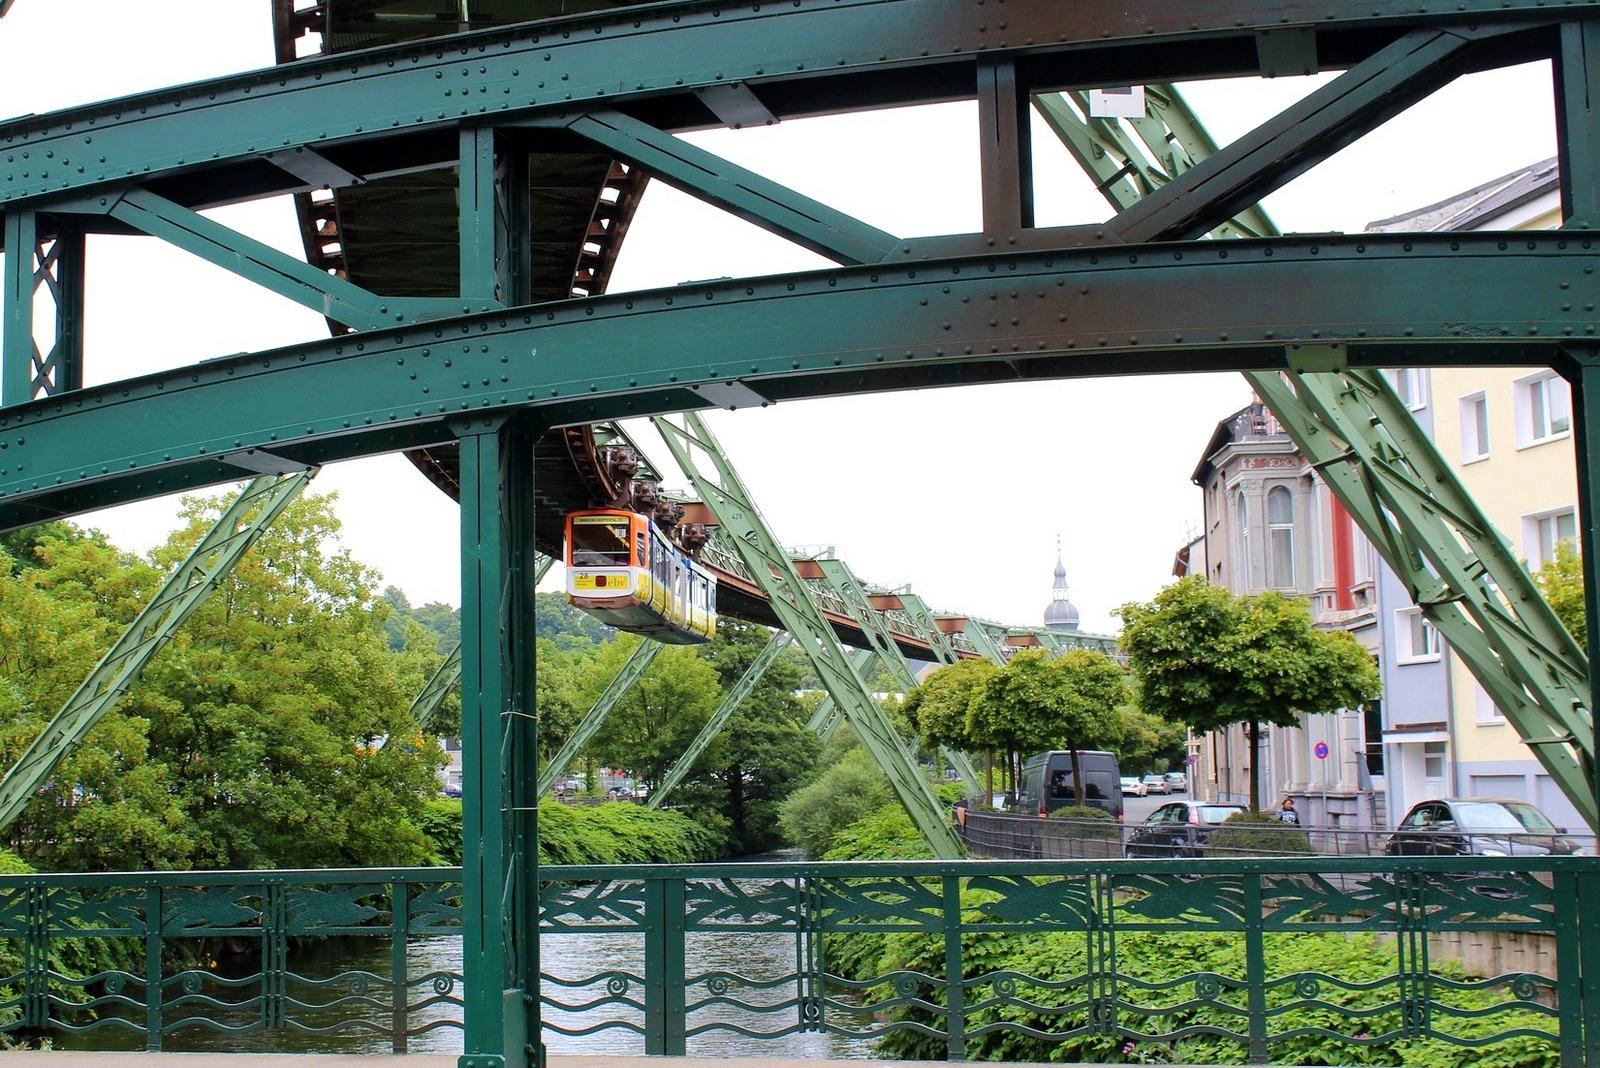 Wuppertaler Schwebebahn - atrakcja obowiązkowa!